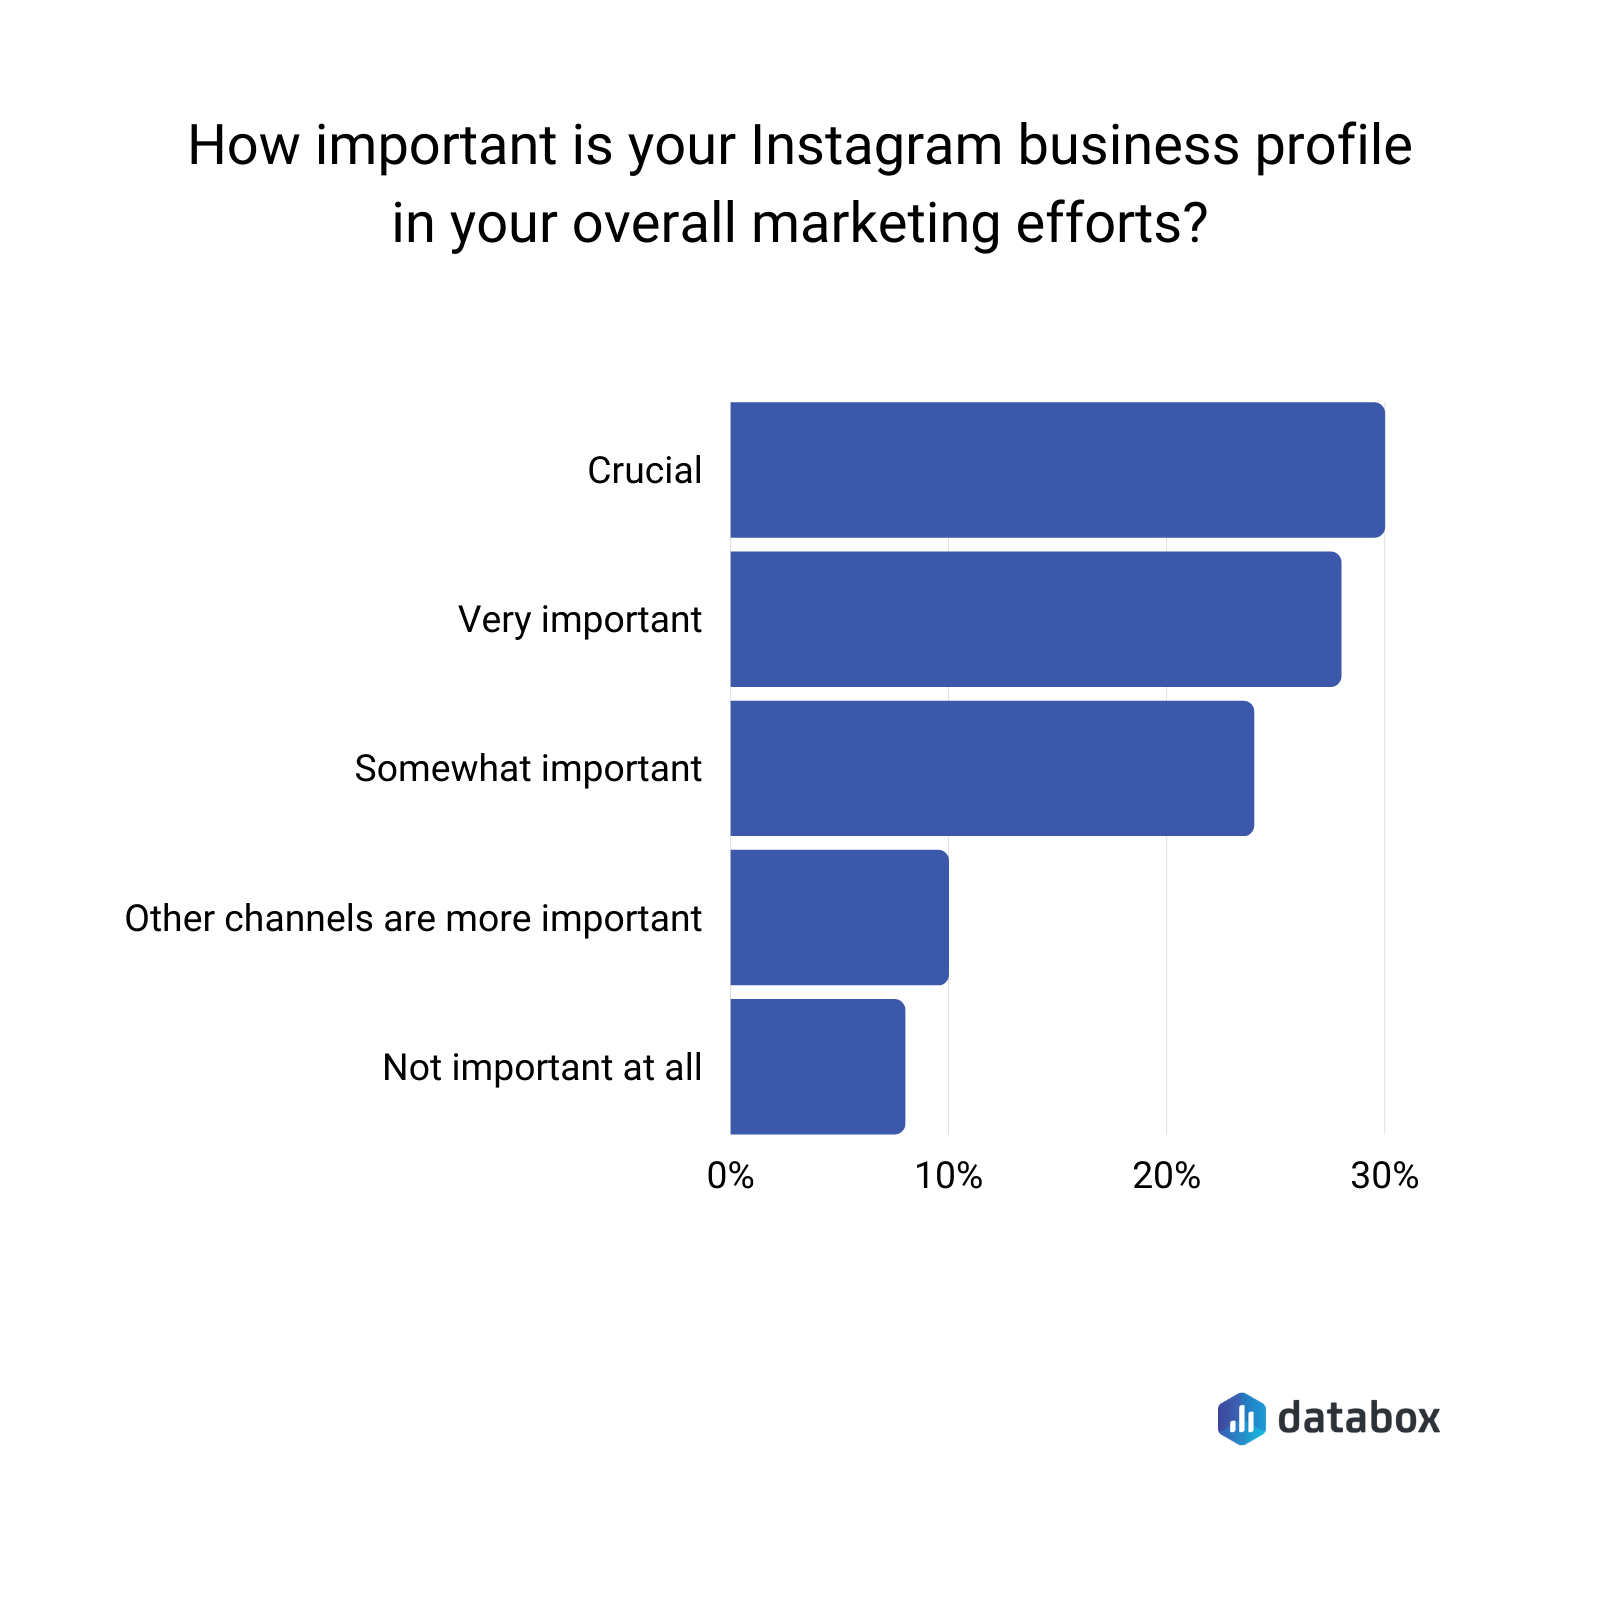 Instagram business profile importance Databox survey results